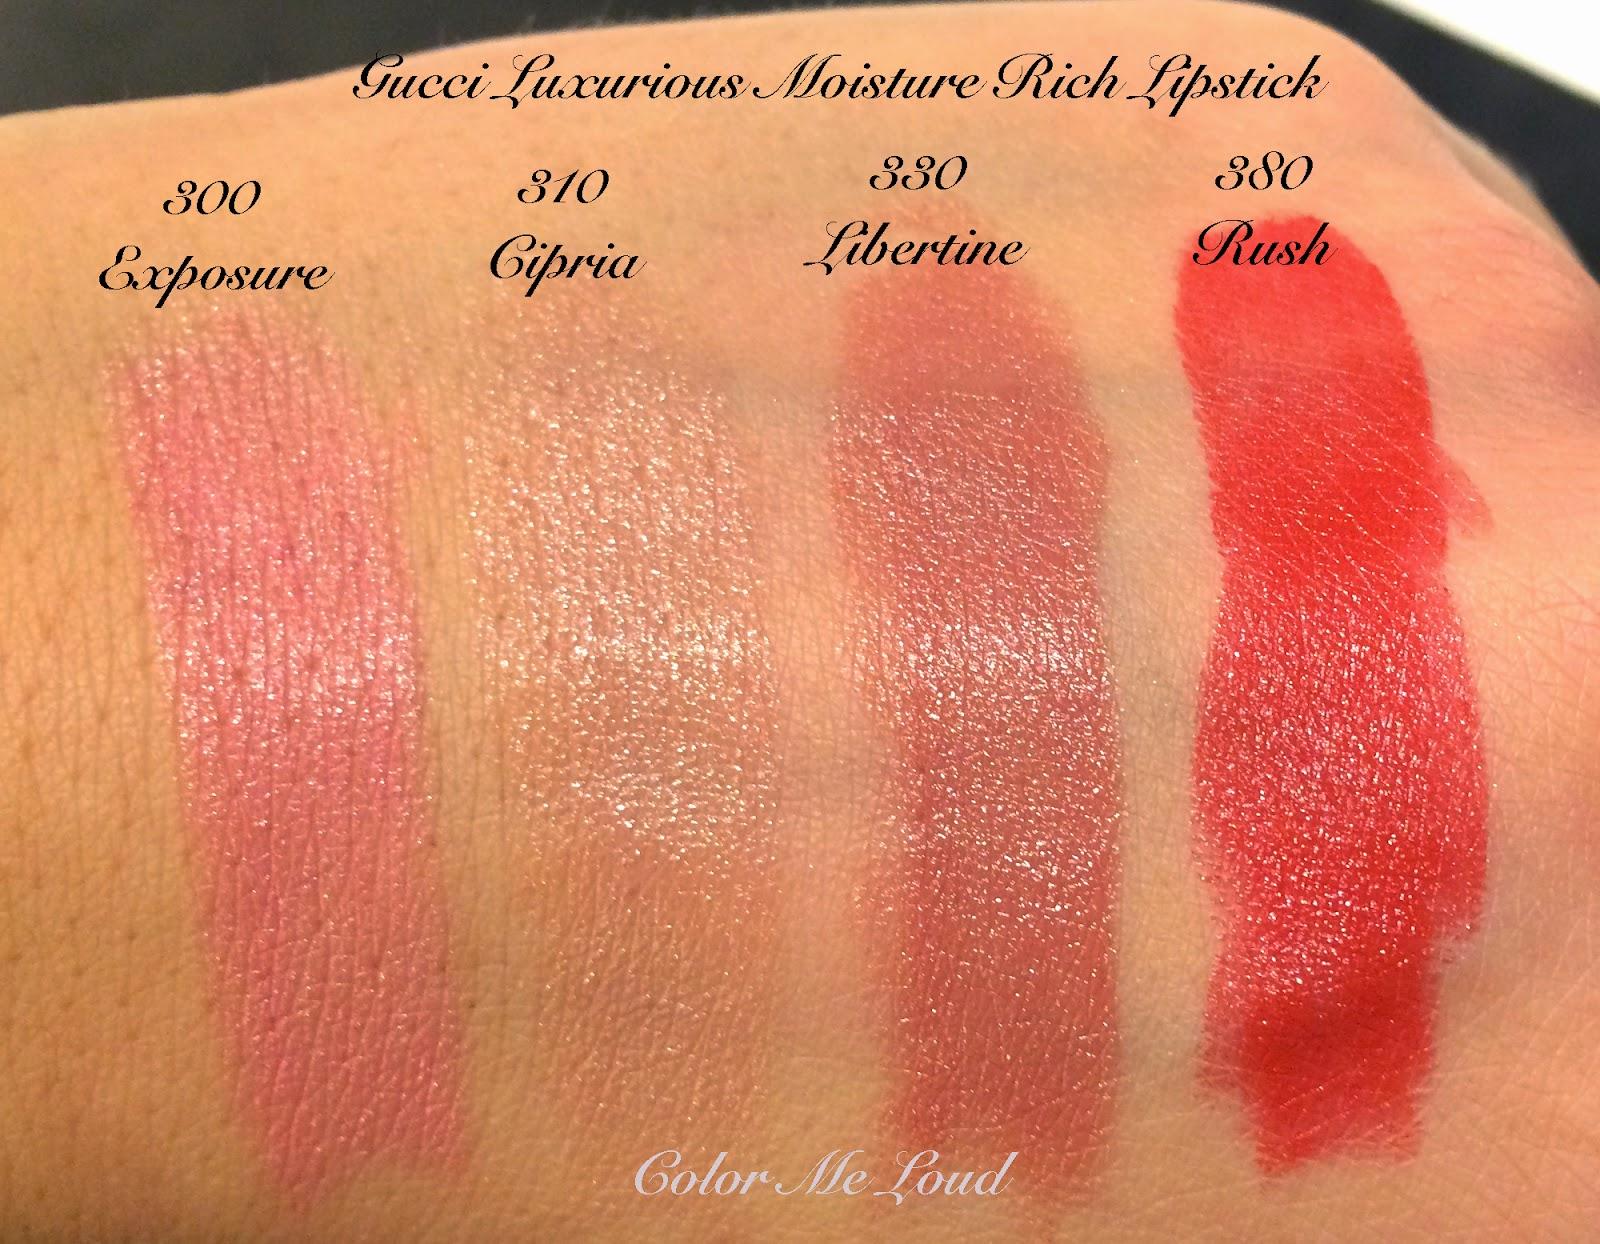 Gucci Luxurious Moisture Rich Lipstick in Exposure, Cipria, Libertine and Rush